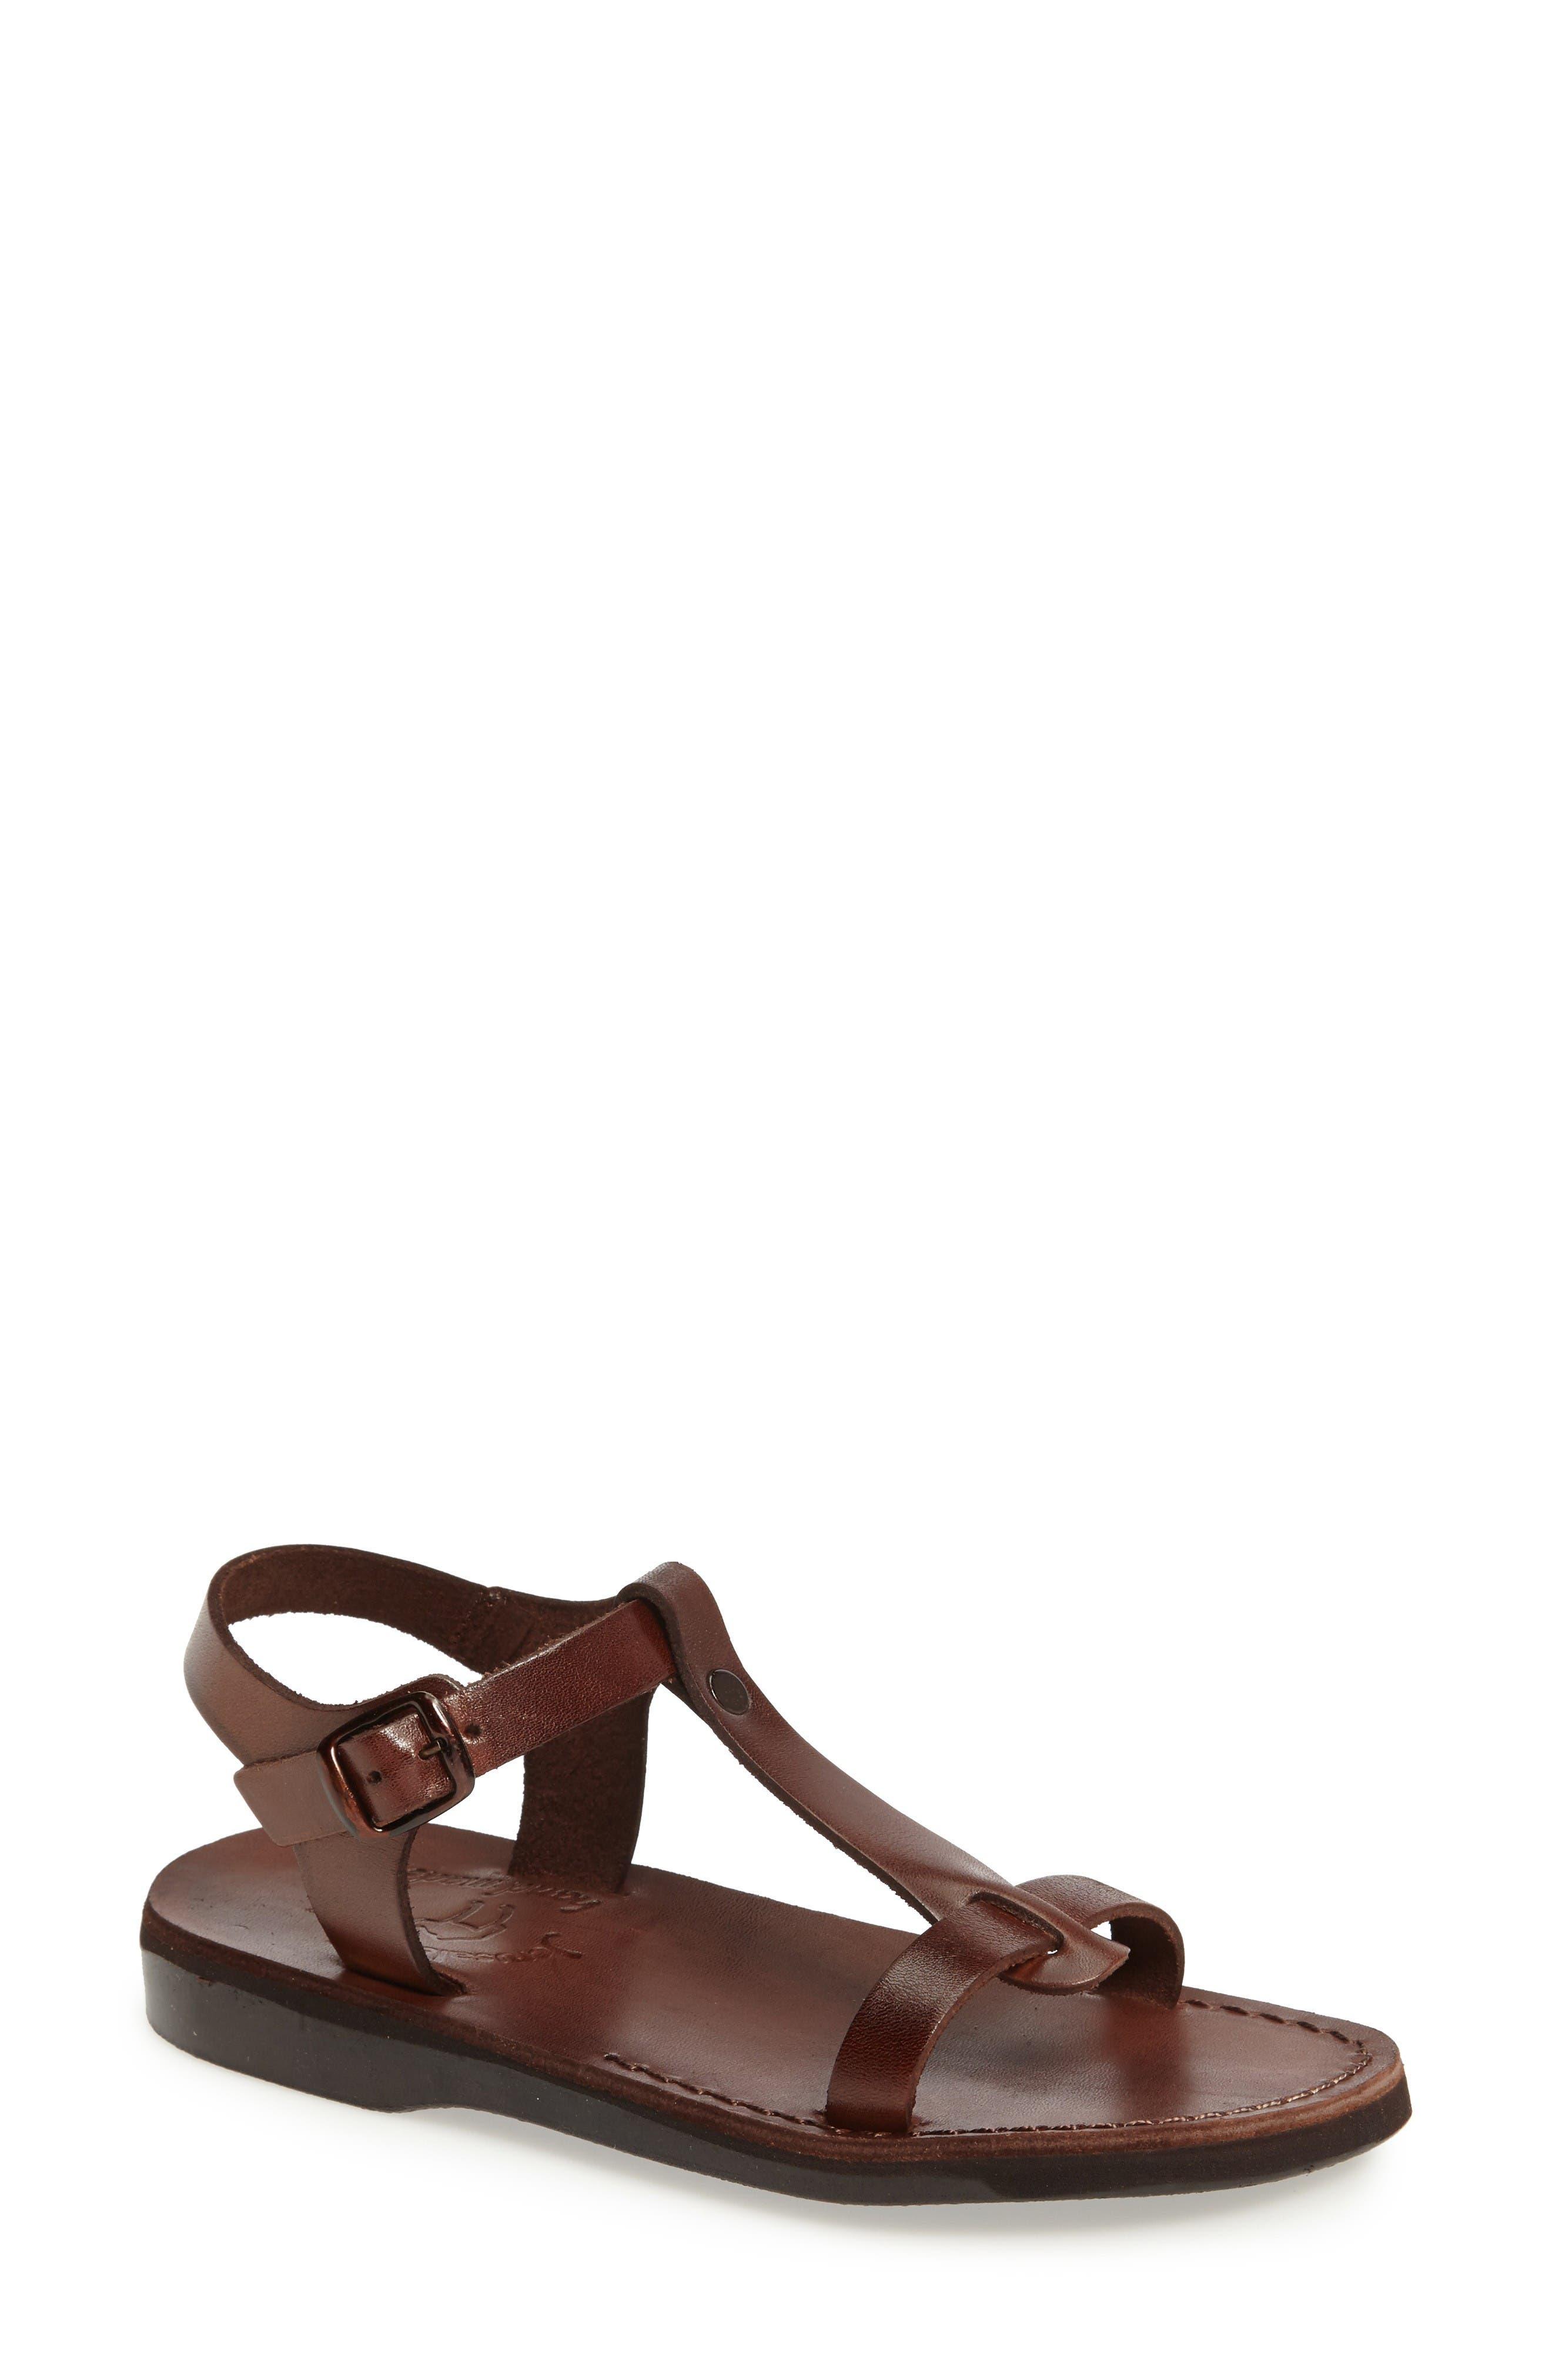 Main Image - Jerusalem Sandals Bathsheba T-Strap Sandal (Women)